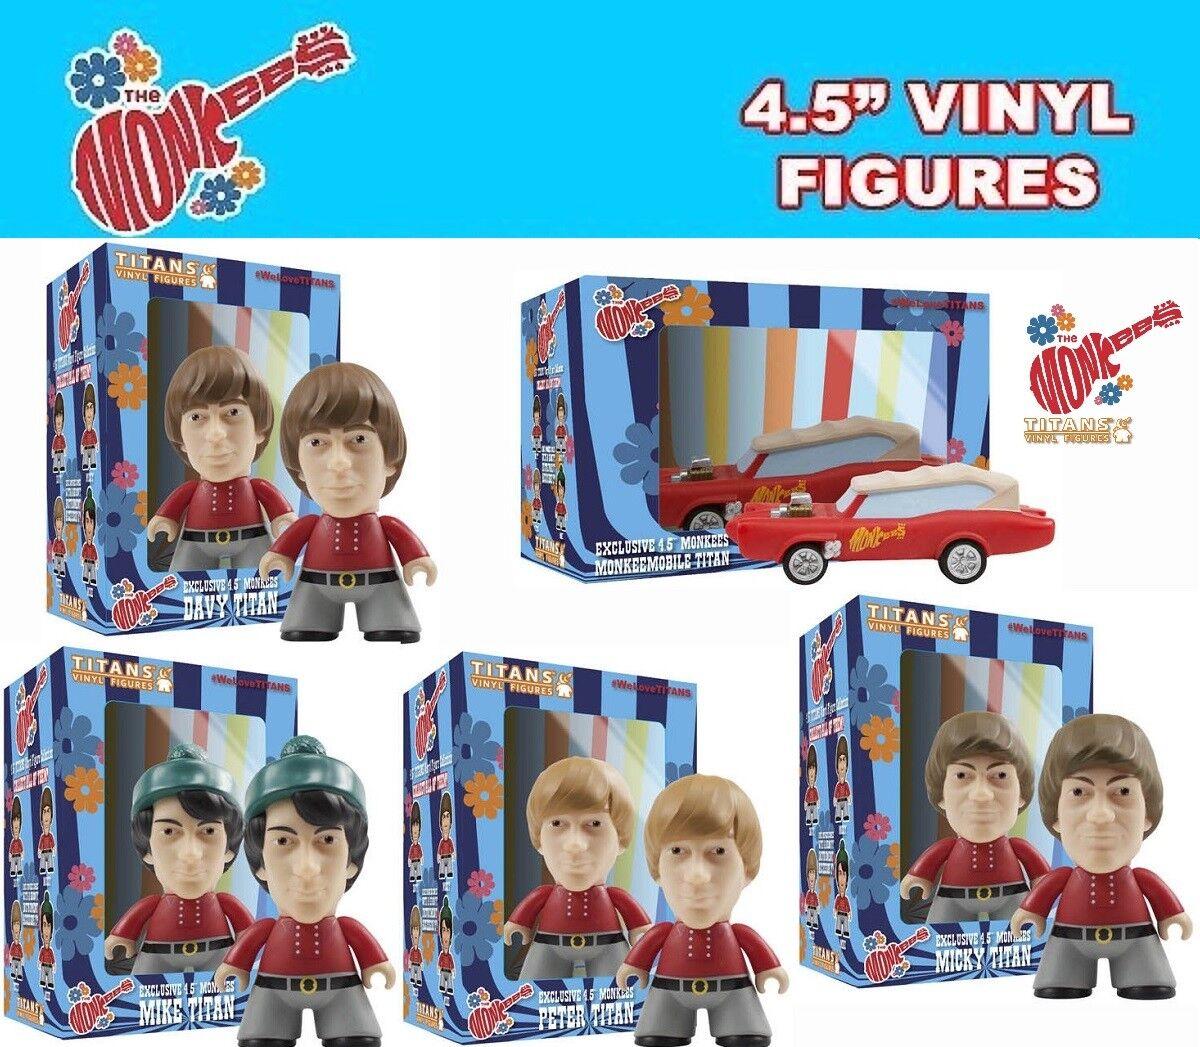 Titans VINILO - Exclusivo 4,5 THE MONKEES Set de figuras - MICKEY,Davy ,Mike ,